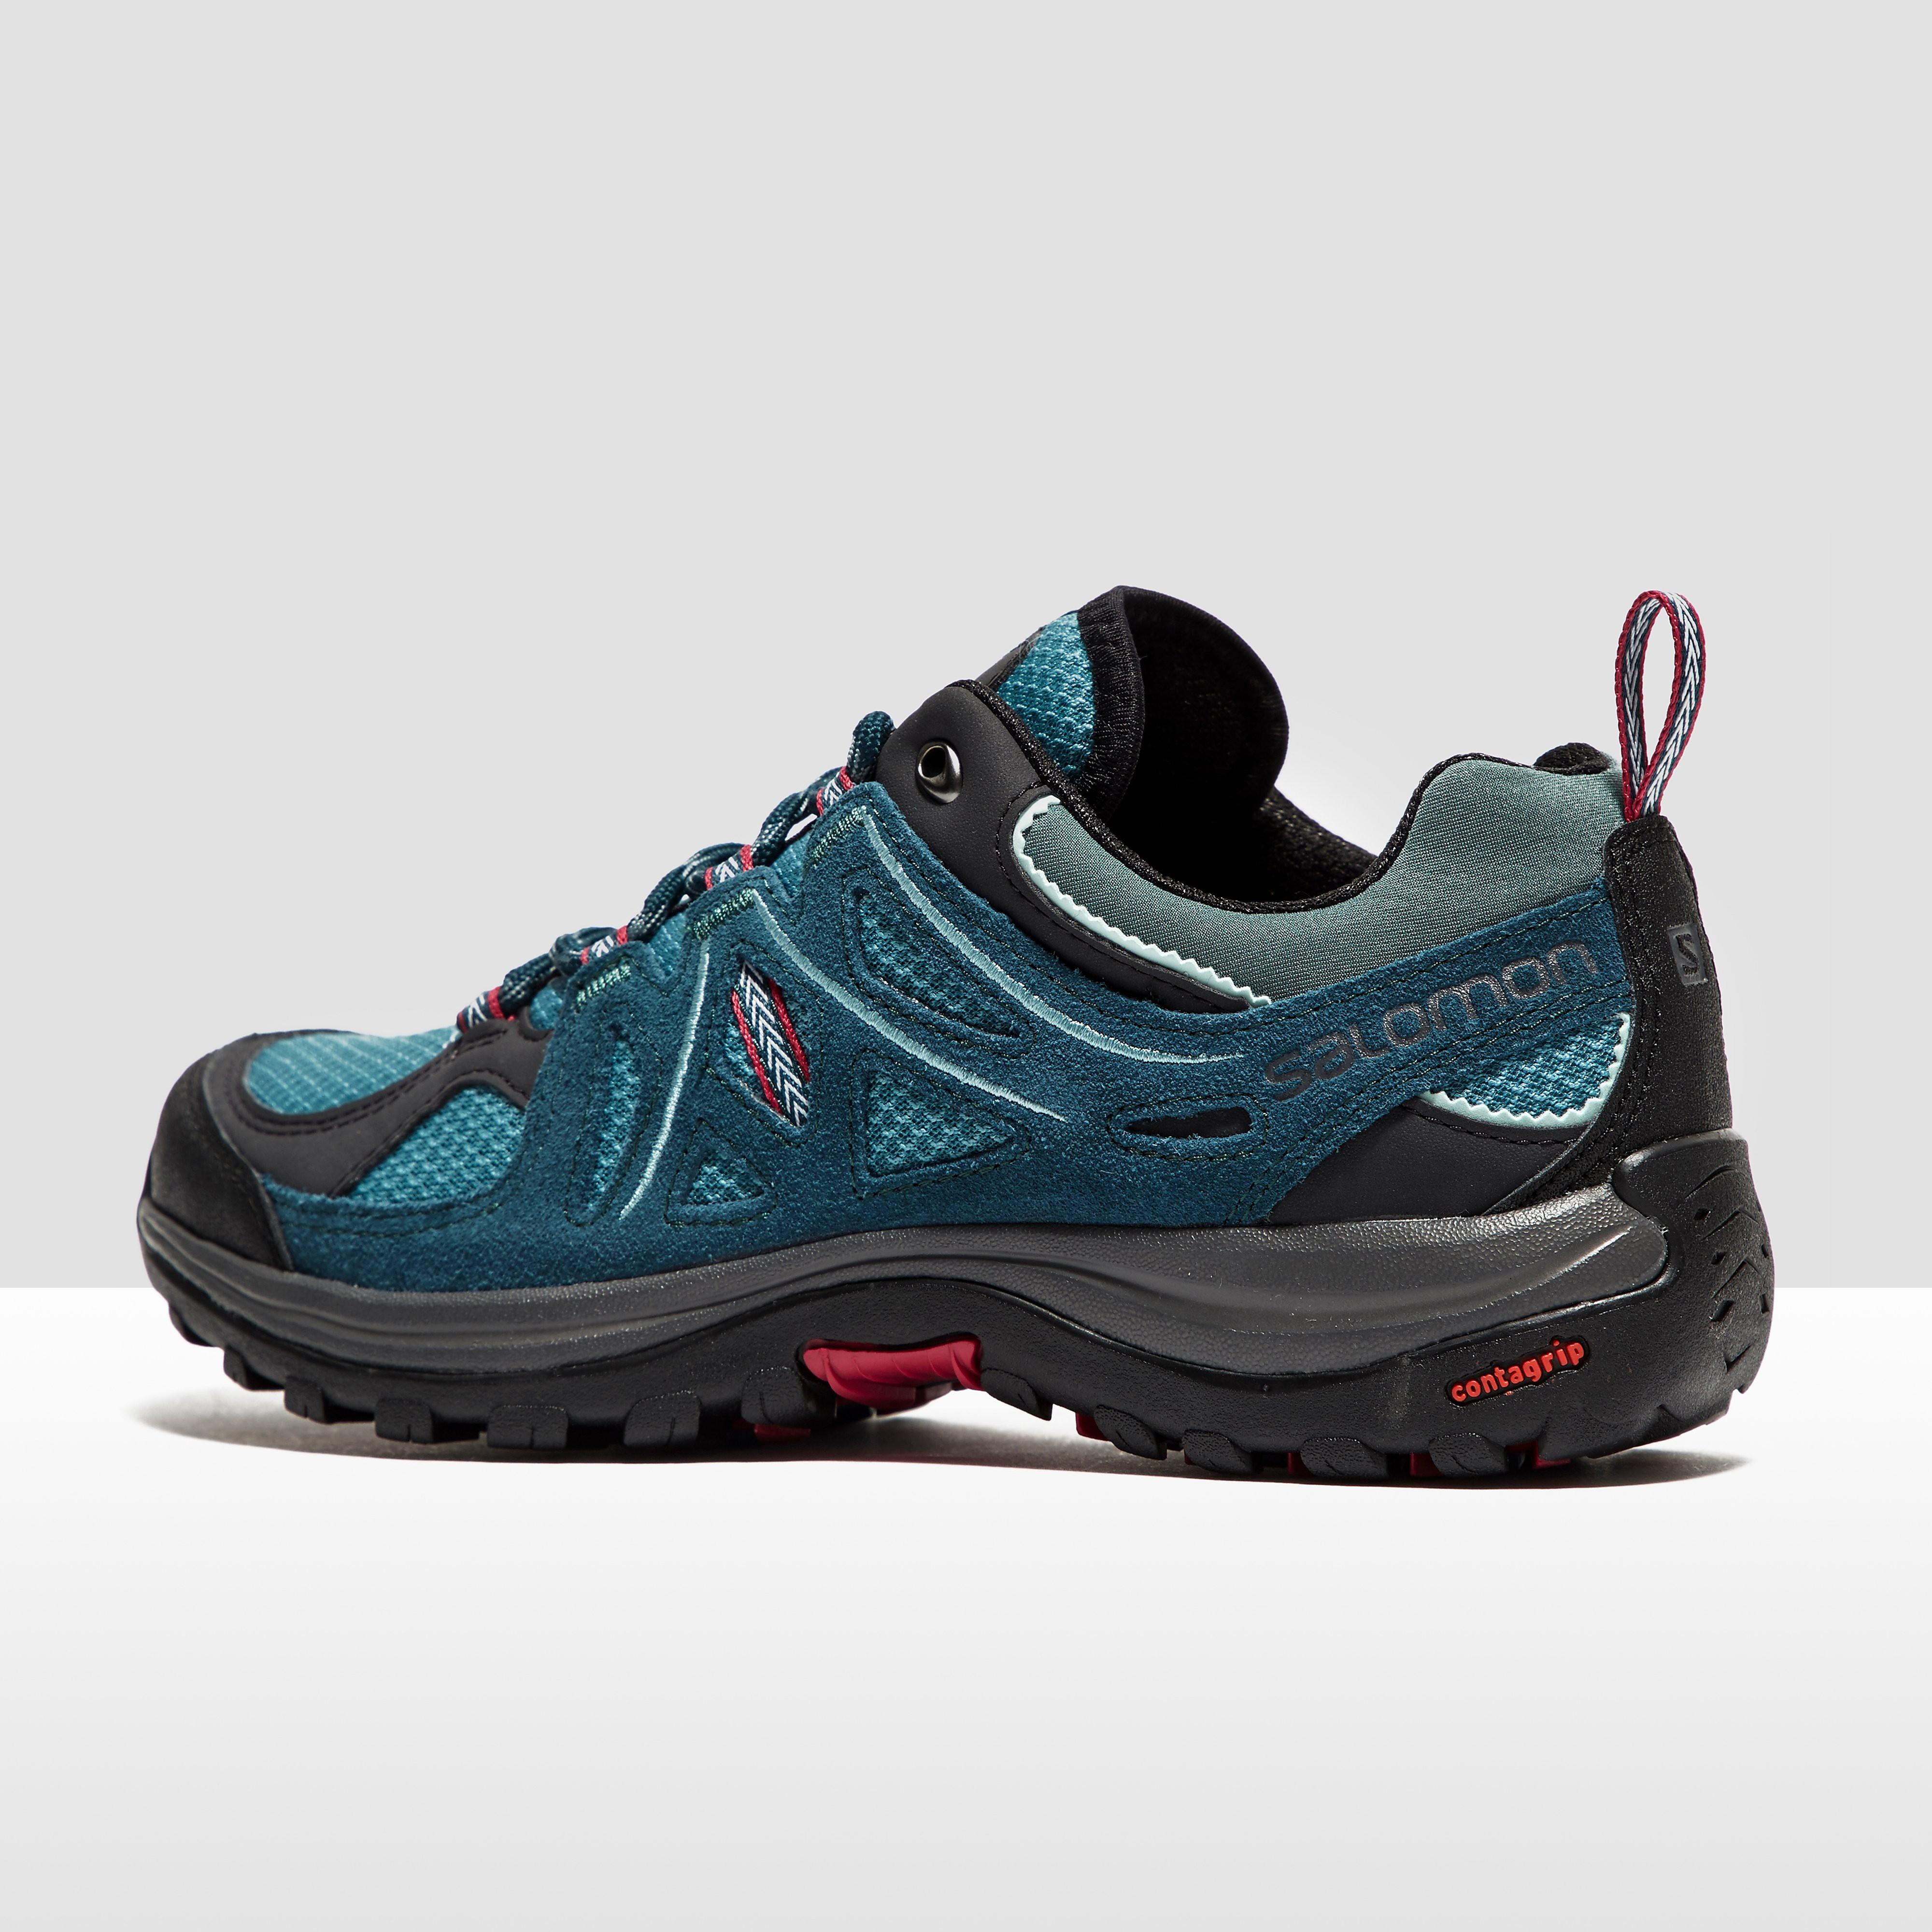 Salomon Ellipse 2 Aero Women's Hiking Shoes